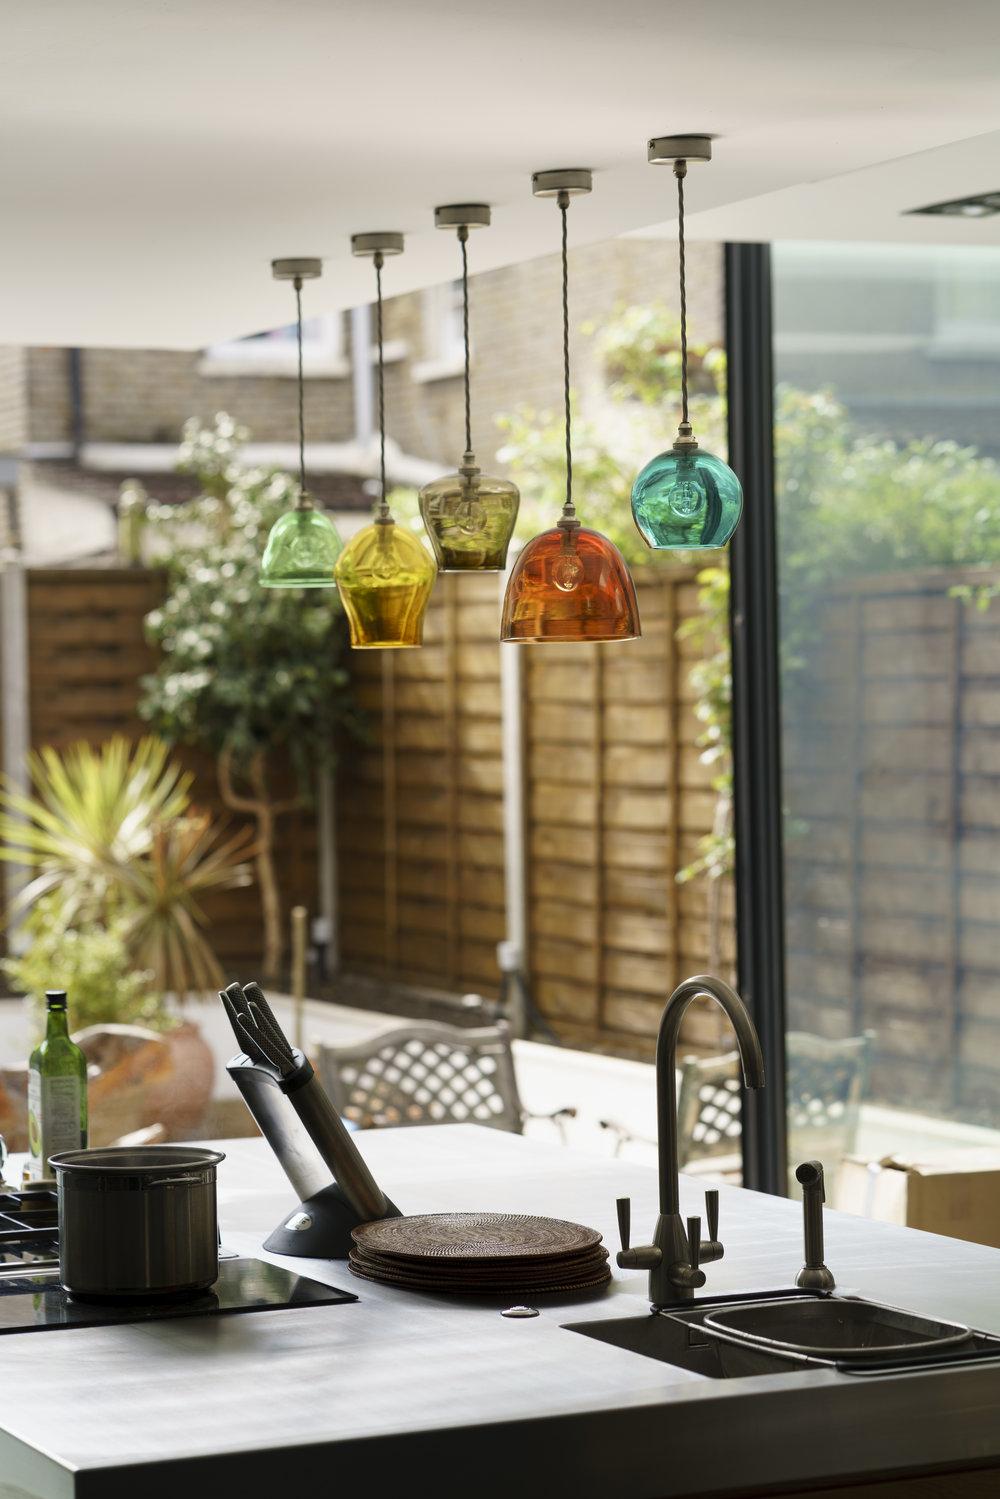 Hand-blown-glass-pendant-light-kitchen-lighting-Classic-Pendants-2.jpg